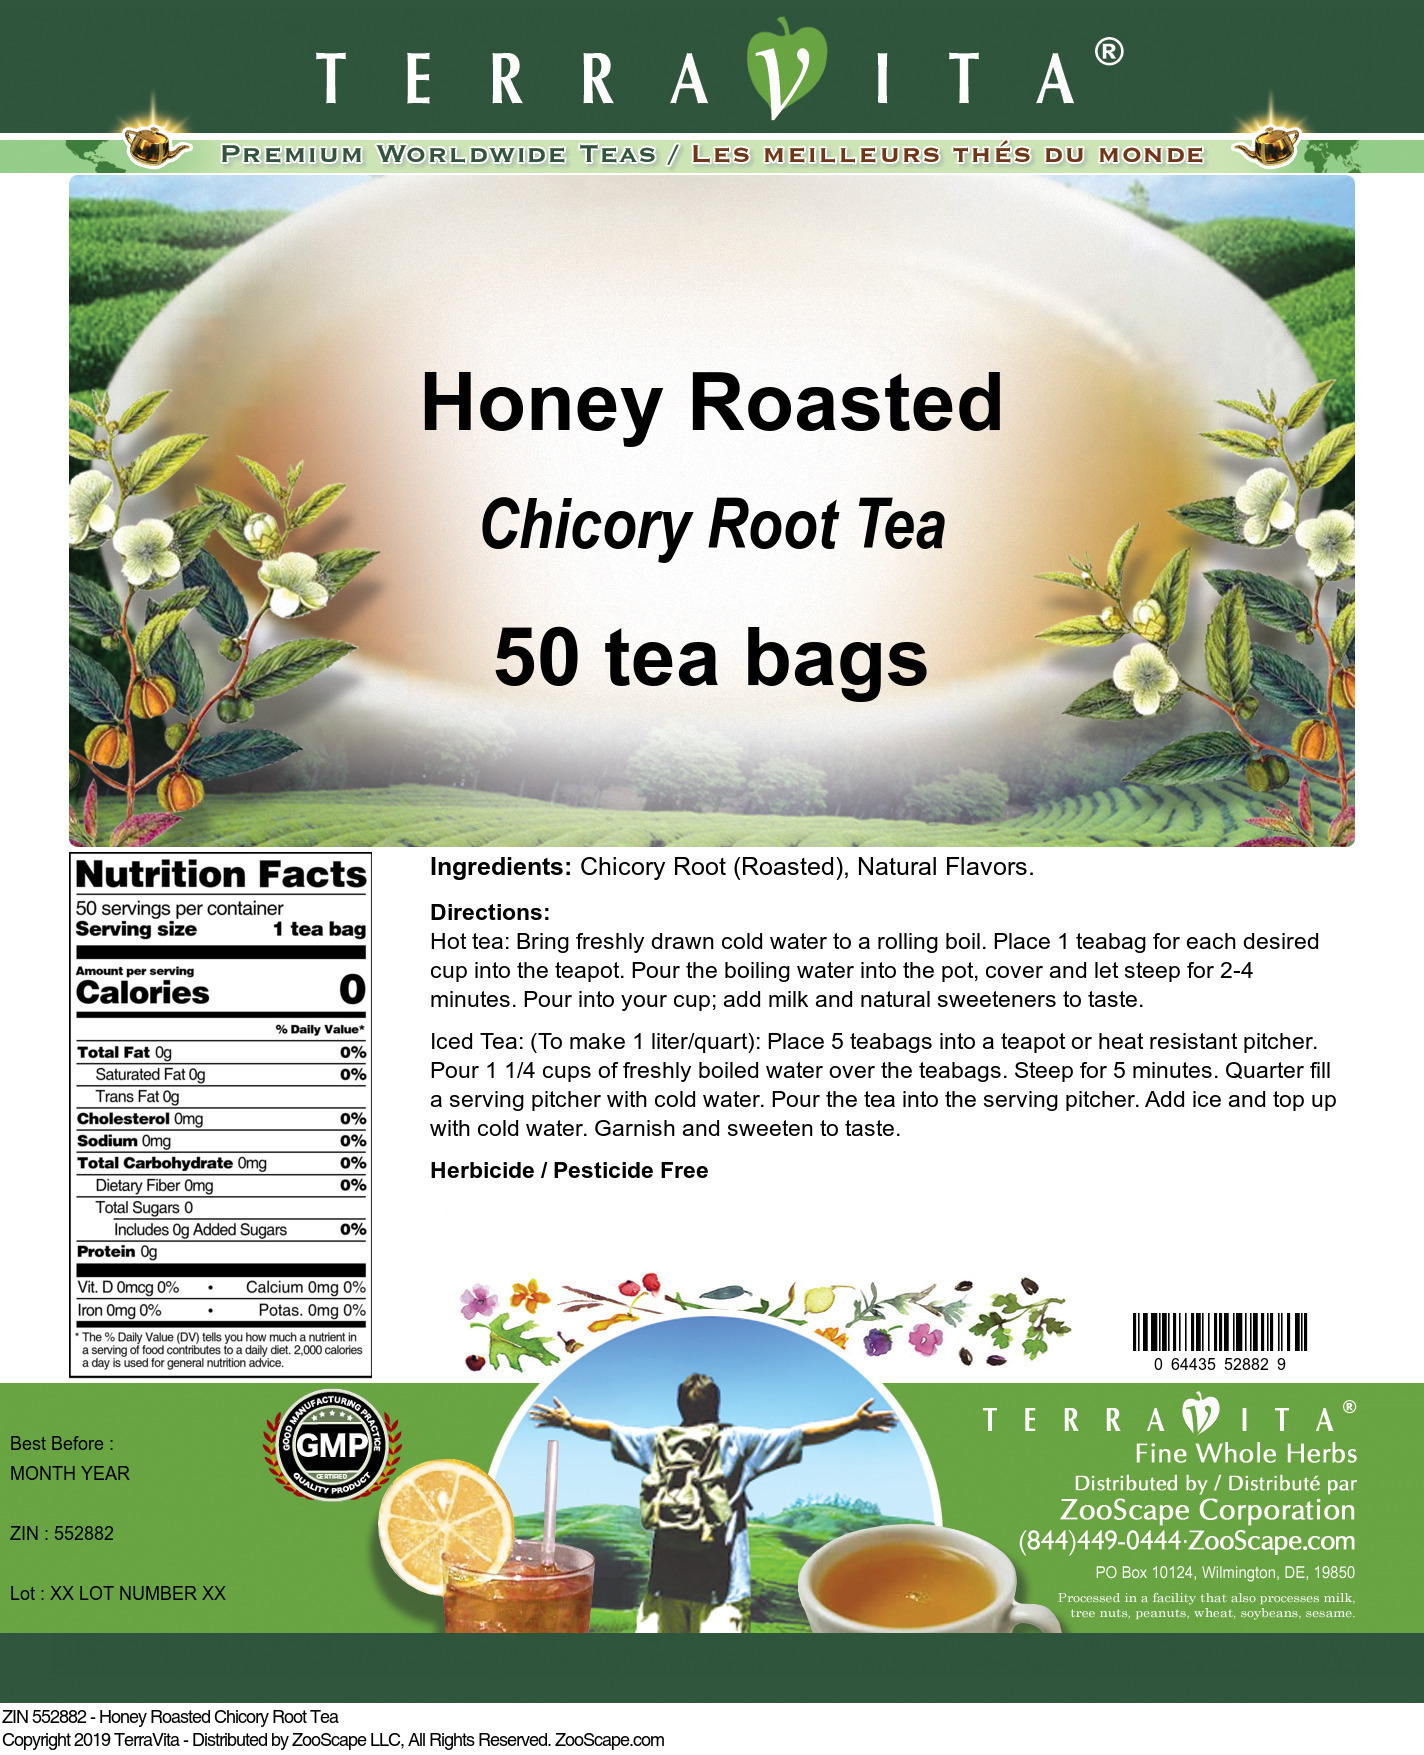 Honey Roasted Chicory Root